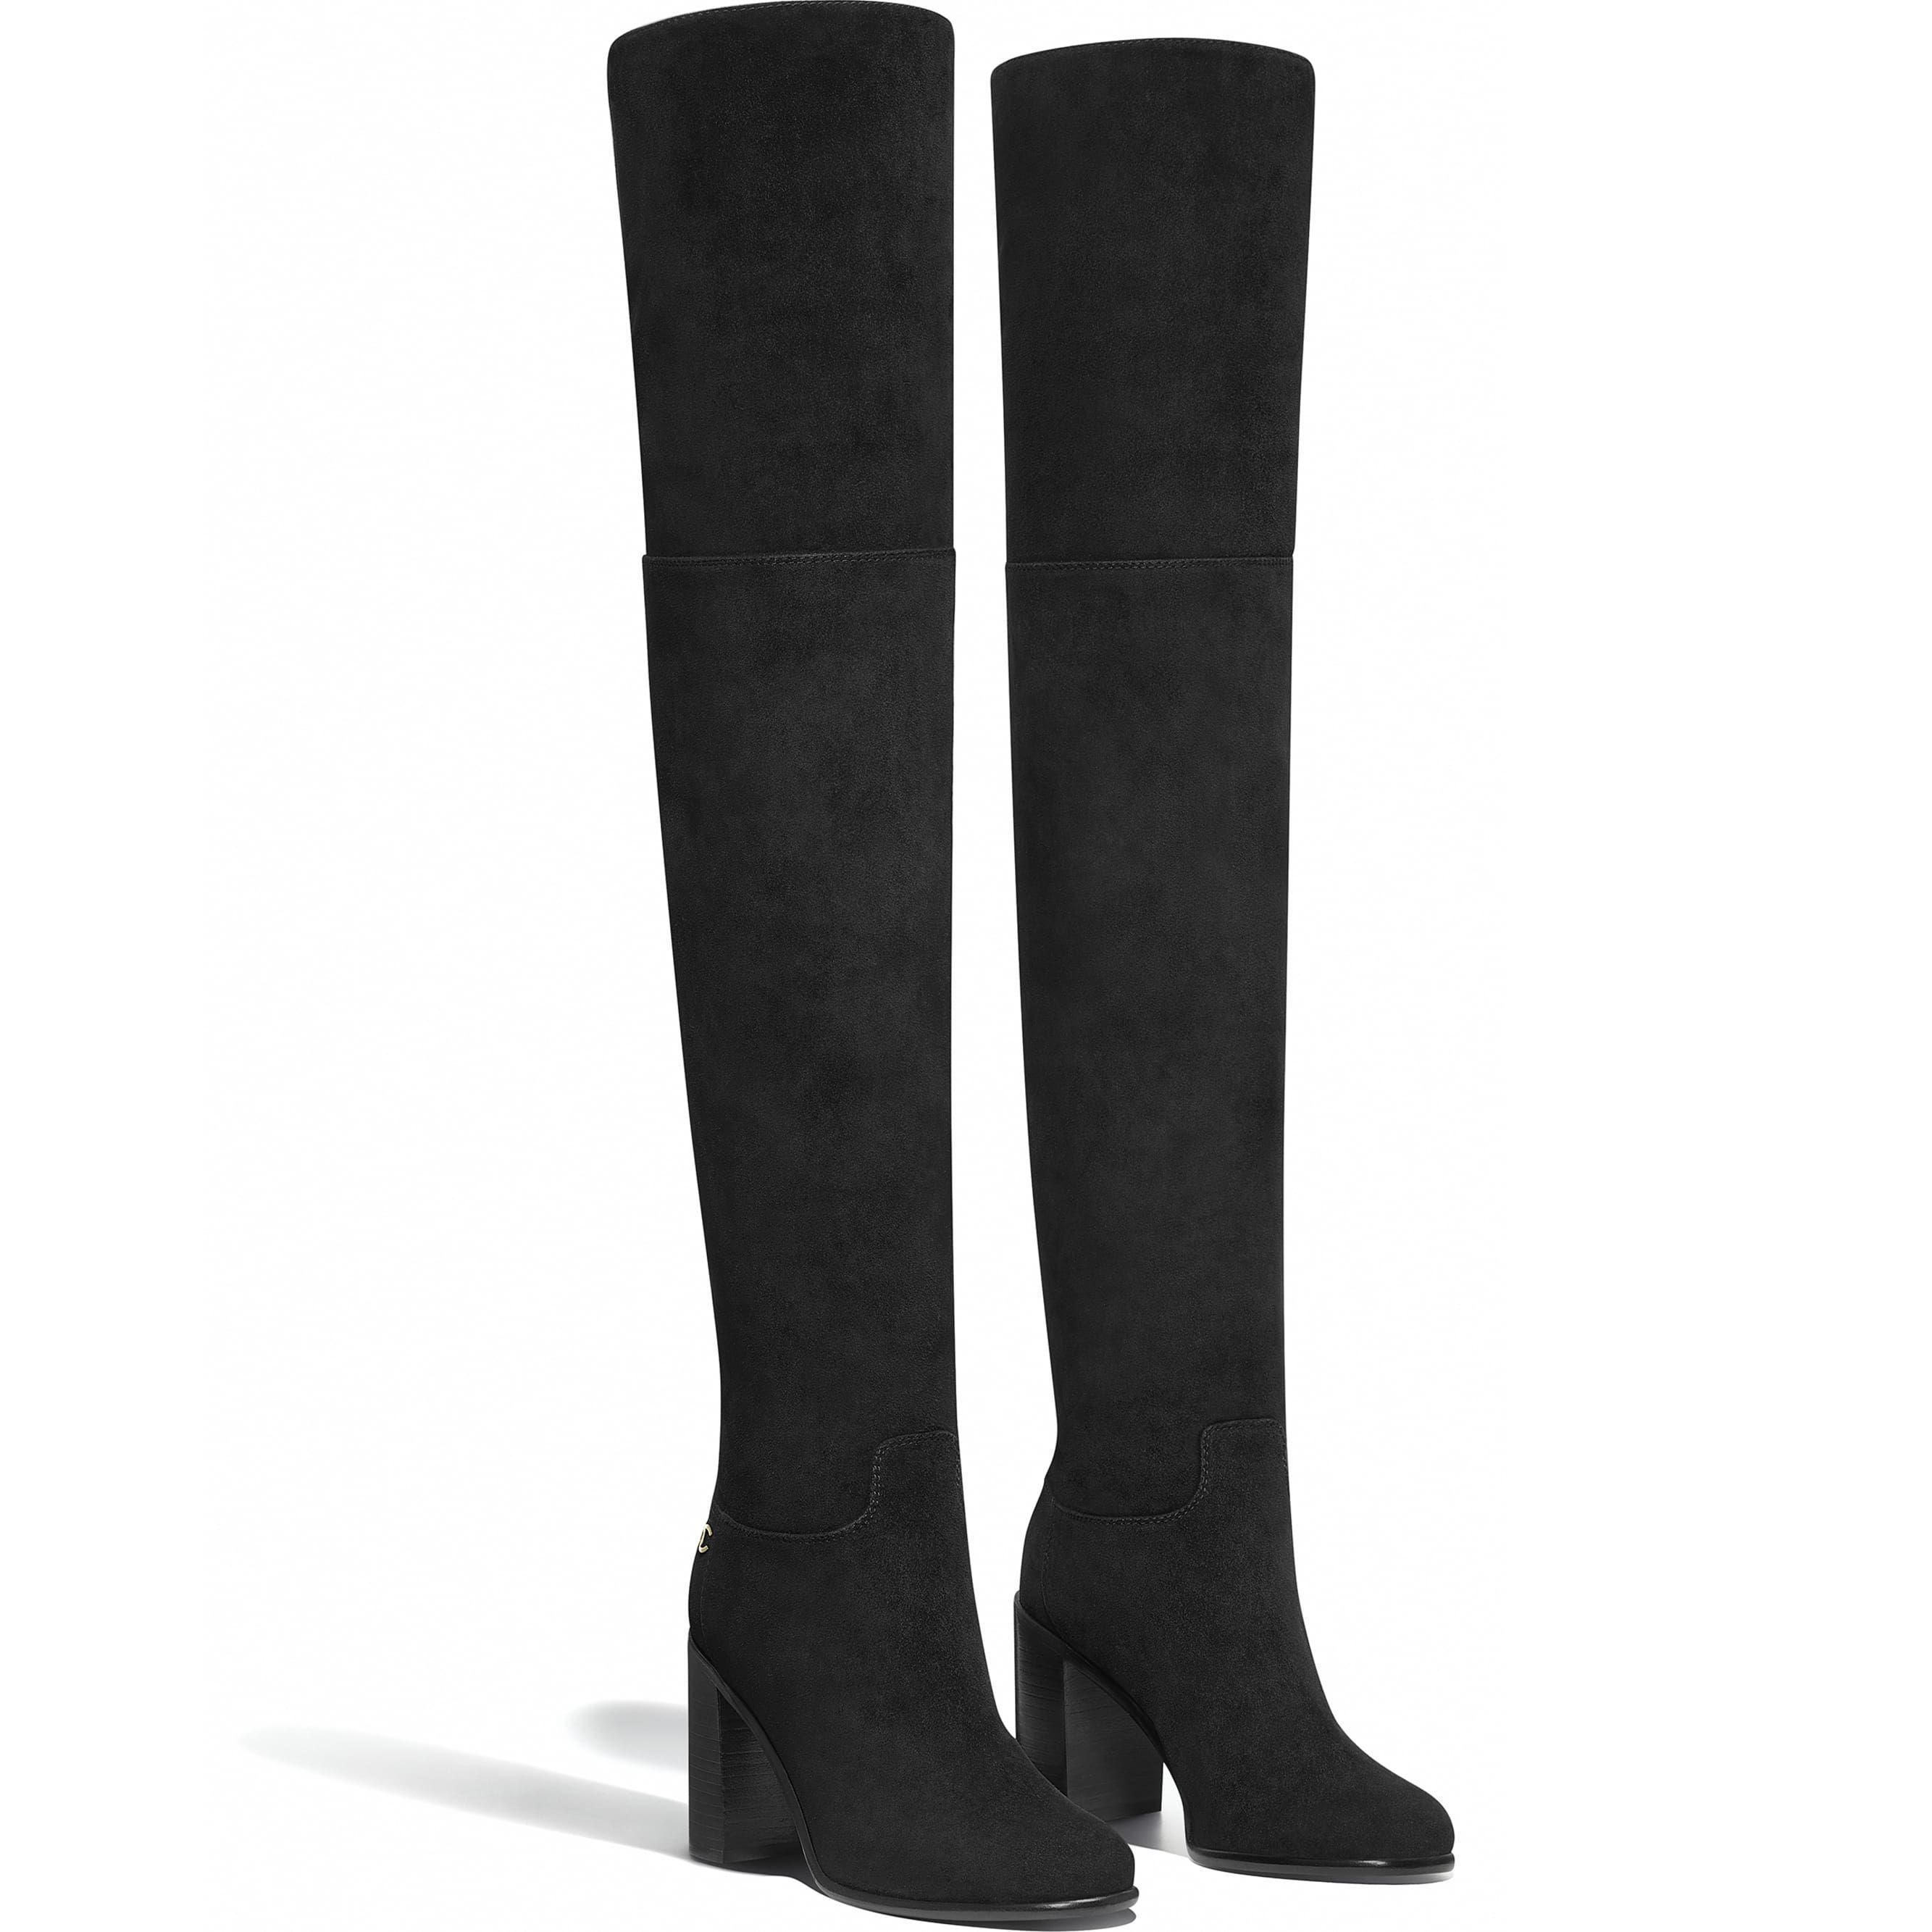 Chanel Pre Fw2018 19 Black Suede Calfskin Thigh High Boots 1 900 Thigh High Suede Boots Thigh High Boots Boots